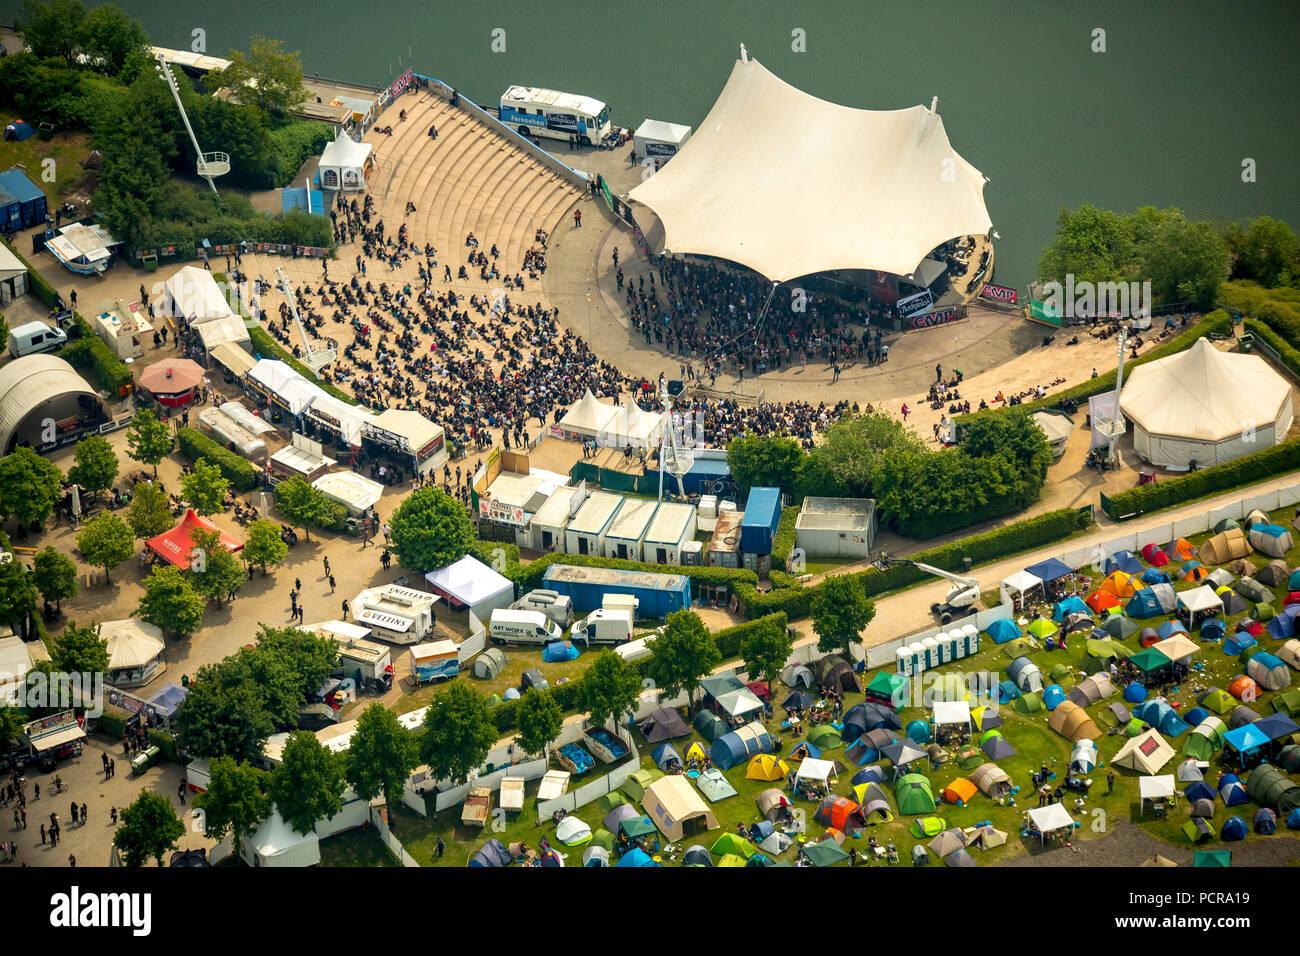 Rock Hard Festival 2015 Amphitheater Gelsenkirchen at Rhein-Herne-Kanal, music festival, tents of rock fans, open air festival, rock concert, Gelsenkirchen, Ruhr area, North Rhine-Westphalia, Germany - Stock Image